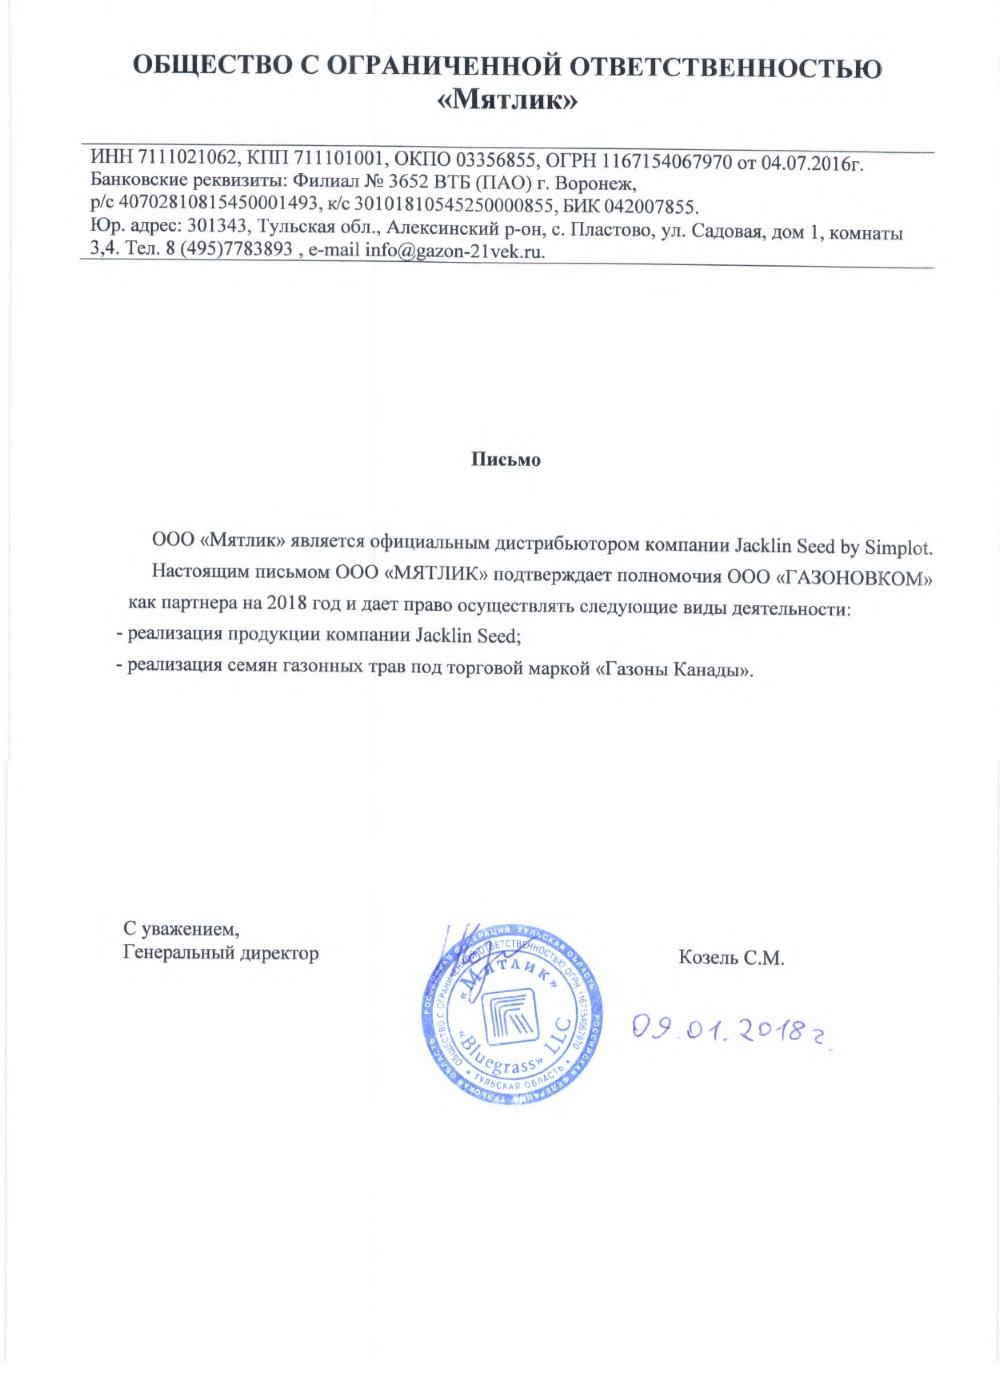 https://gazonov.com/images/upload/pismo-jacklin-1.jpg